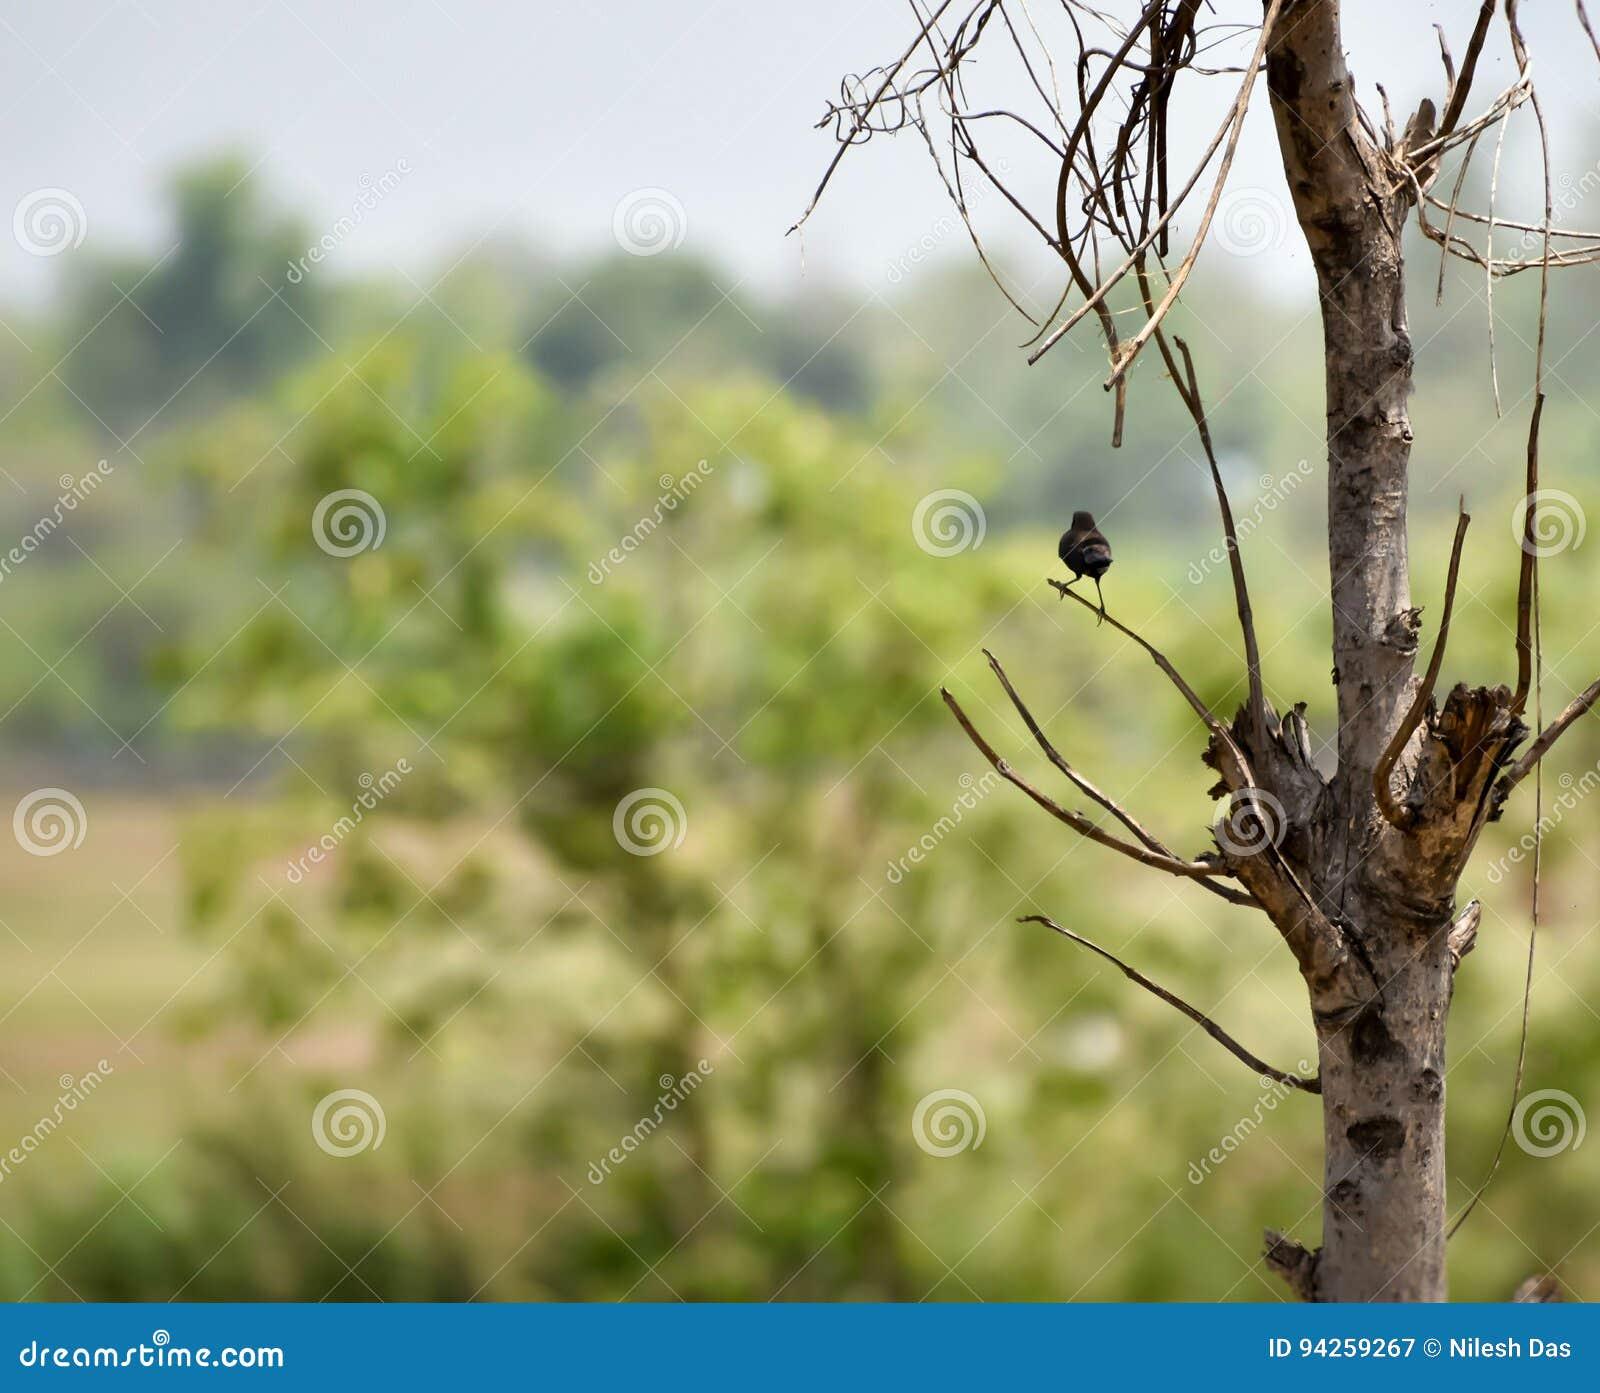 Indian Robin stock image  Image of nikon, indian, species - 94259267